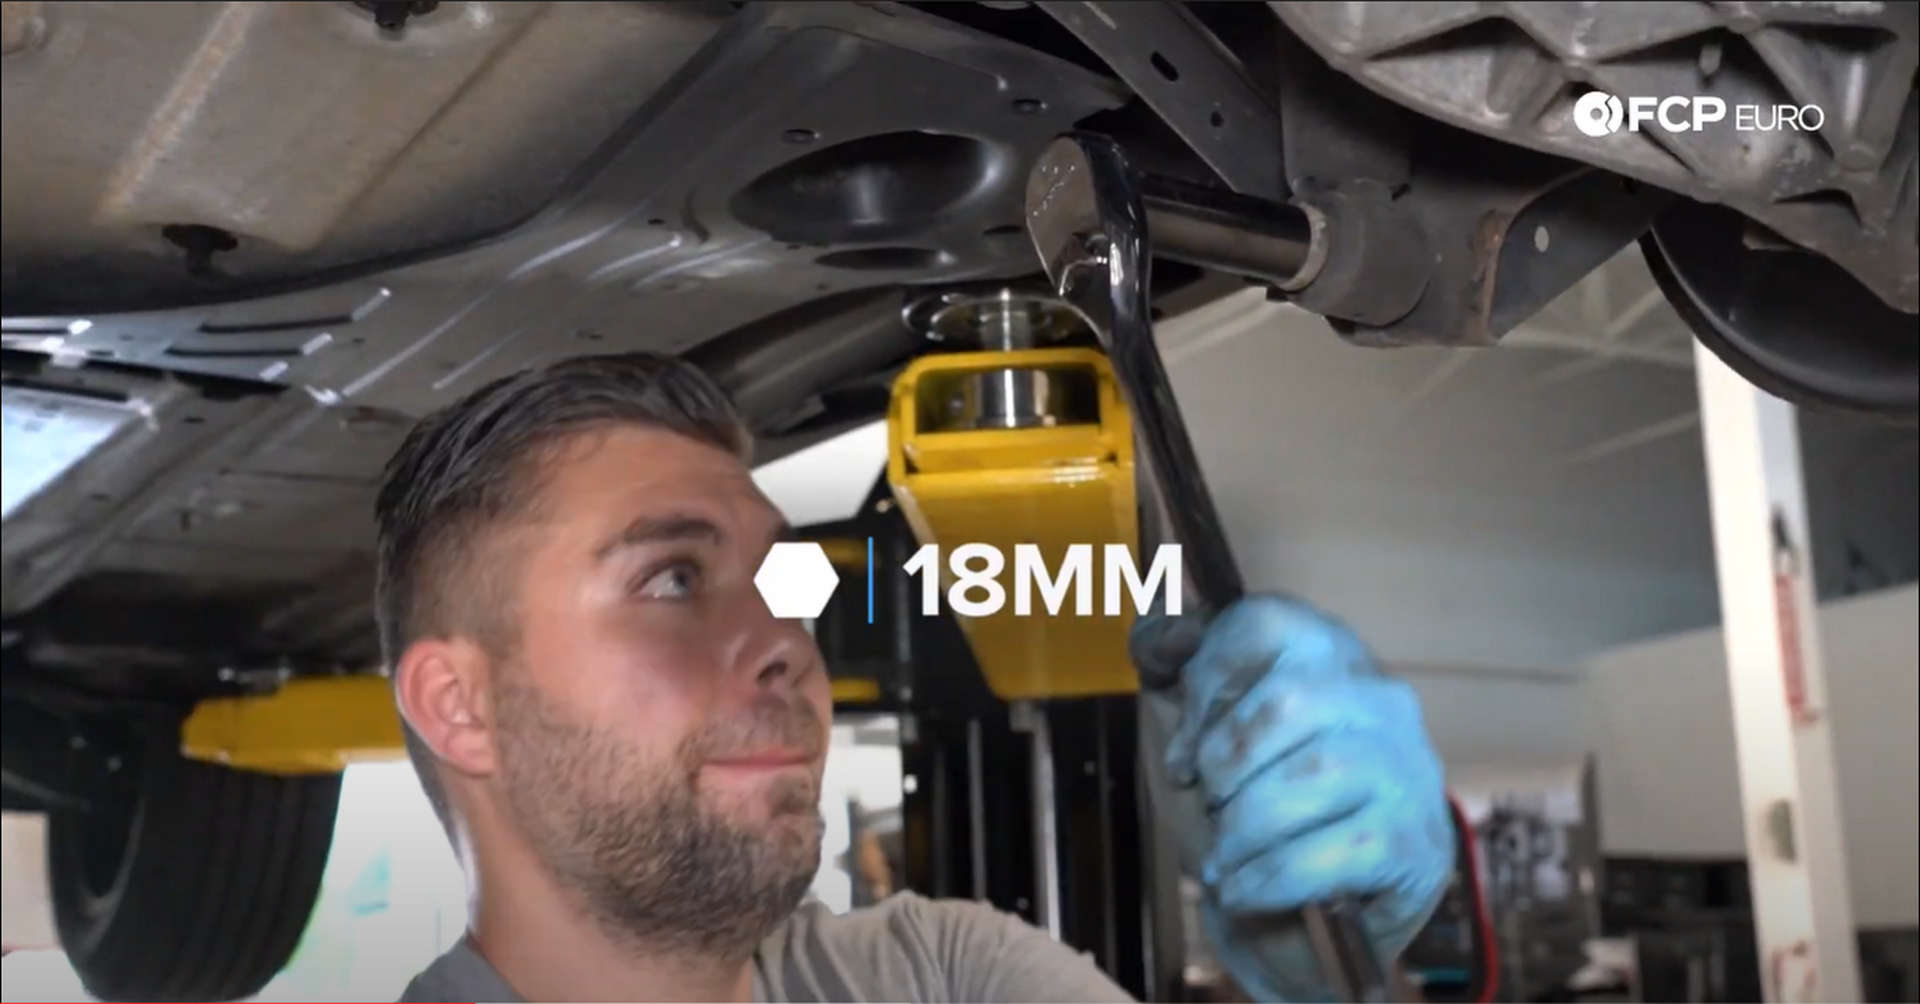 DIY Volvo Rear Shocks removing the lower shock mounting bolt